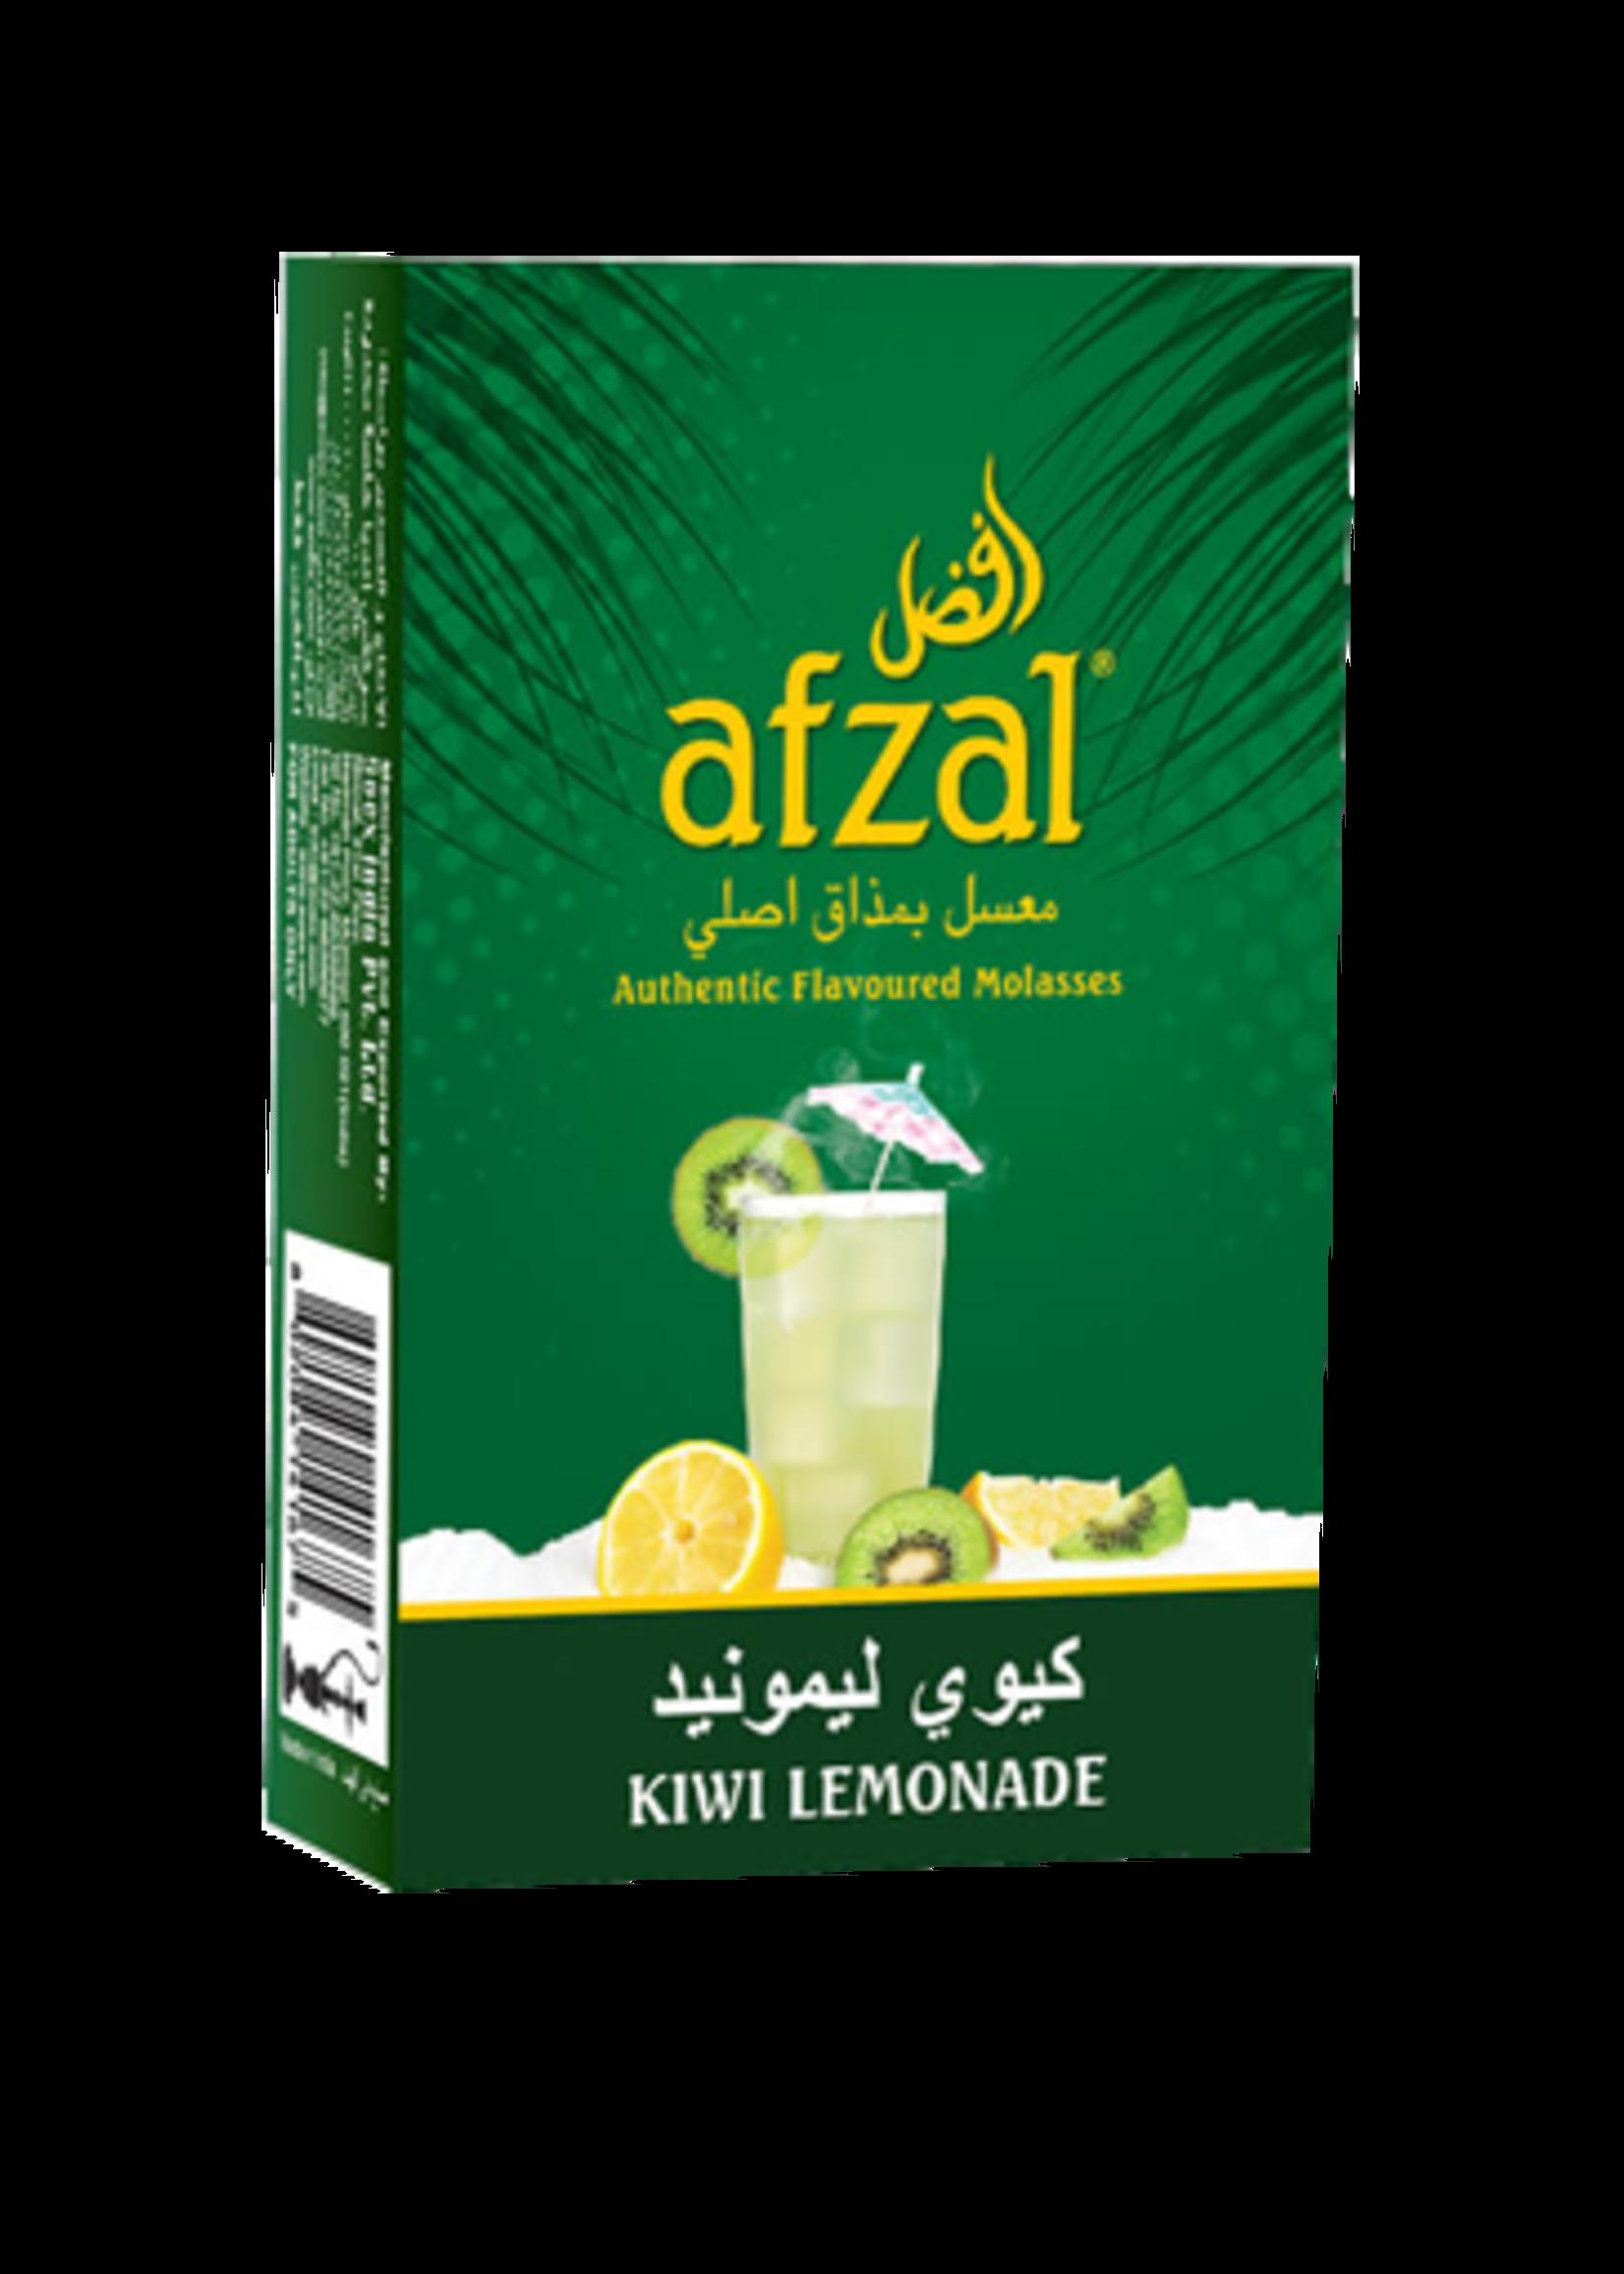 Afzal hubbly flavour - kiwi lemonade